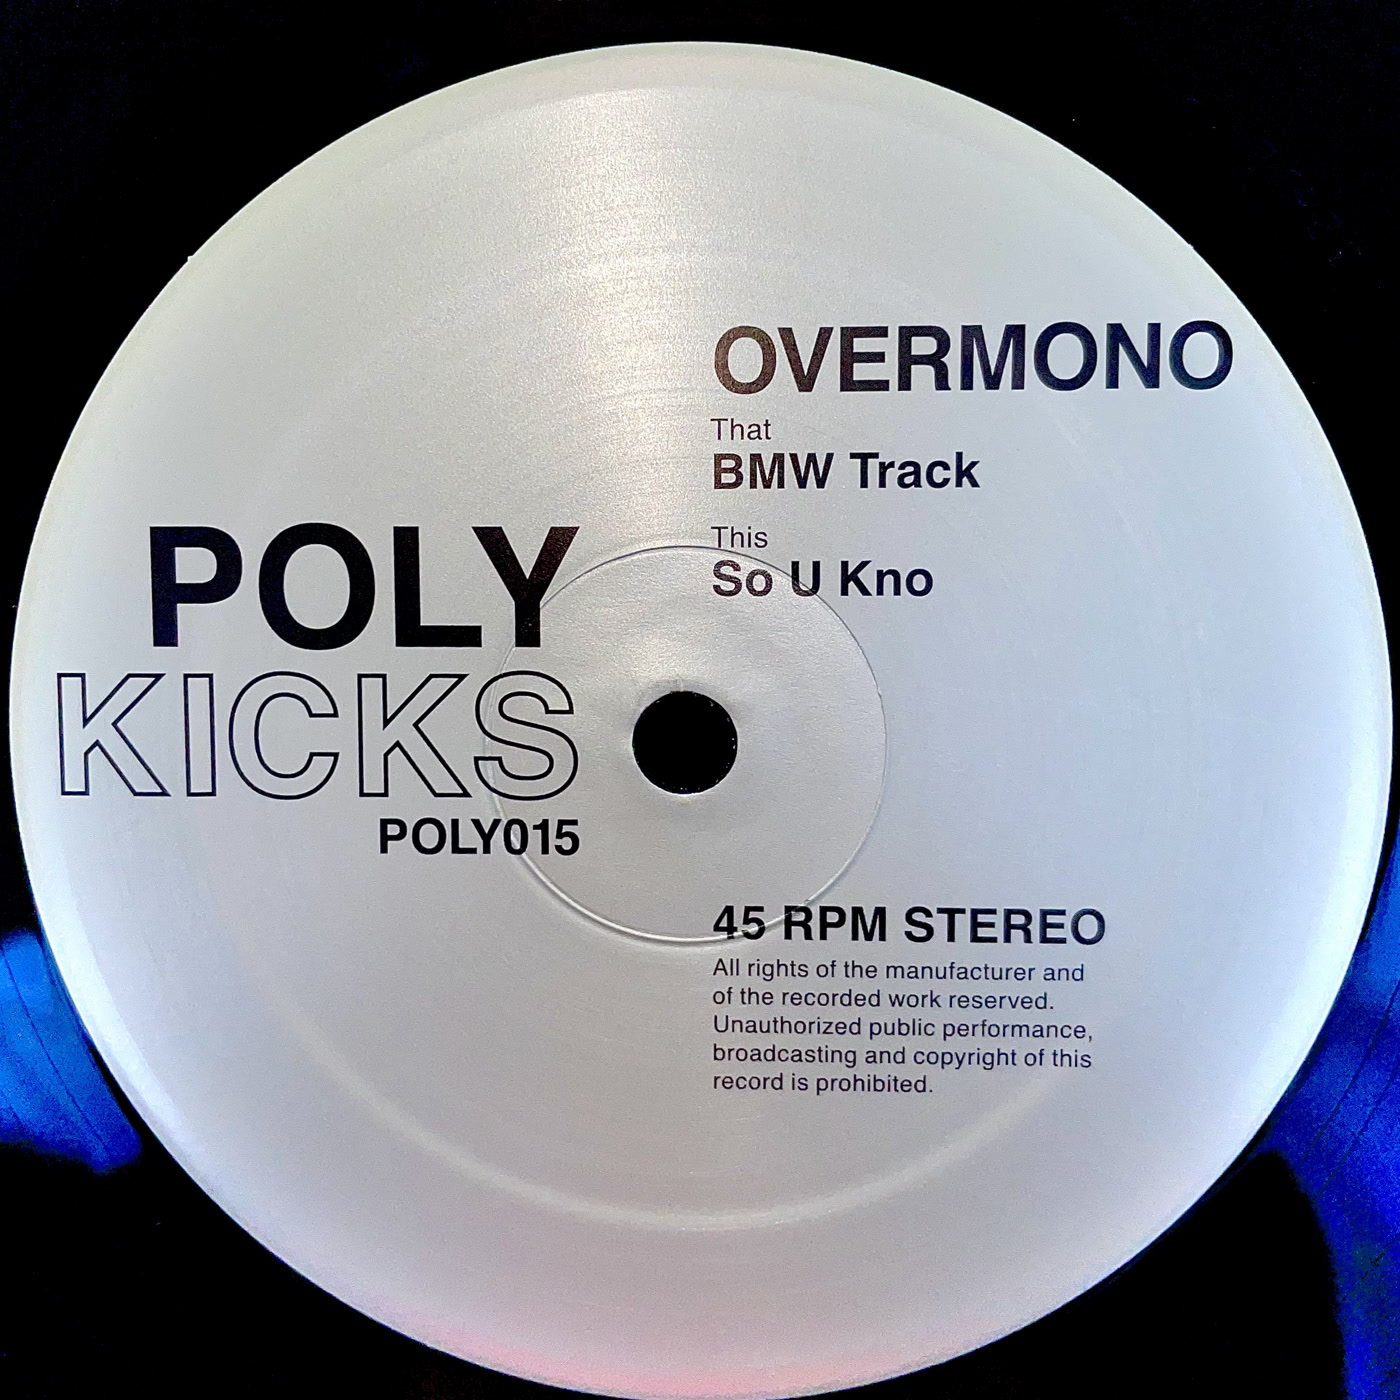 Overmono – BMW Track / So U Kno (Poly Kicks)